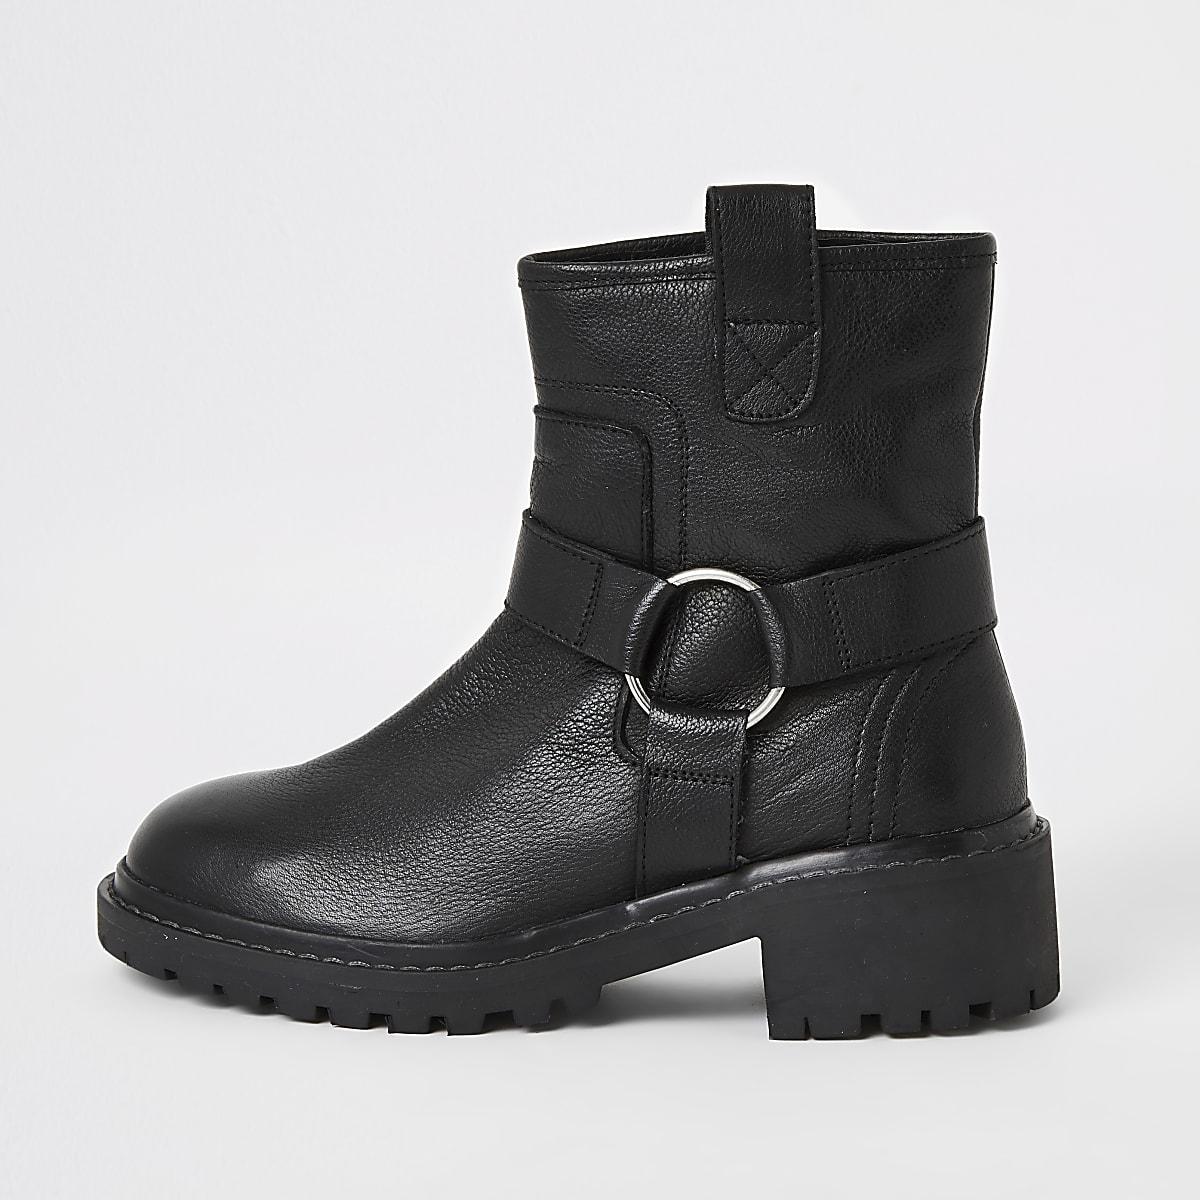 Black leather harness biker boots